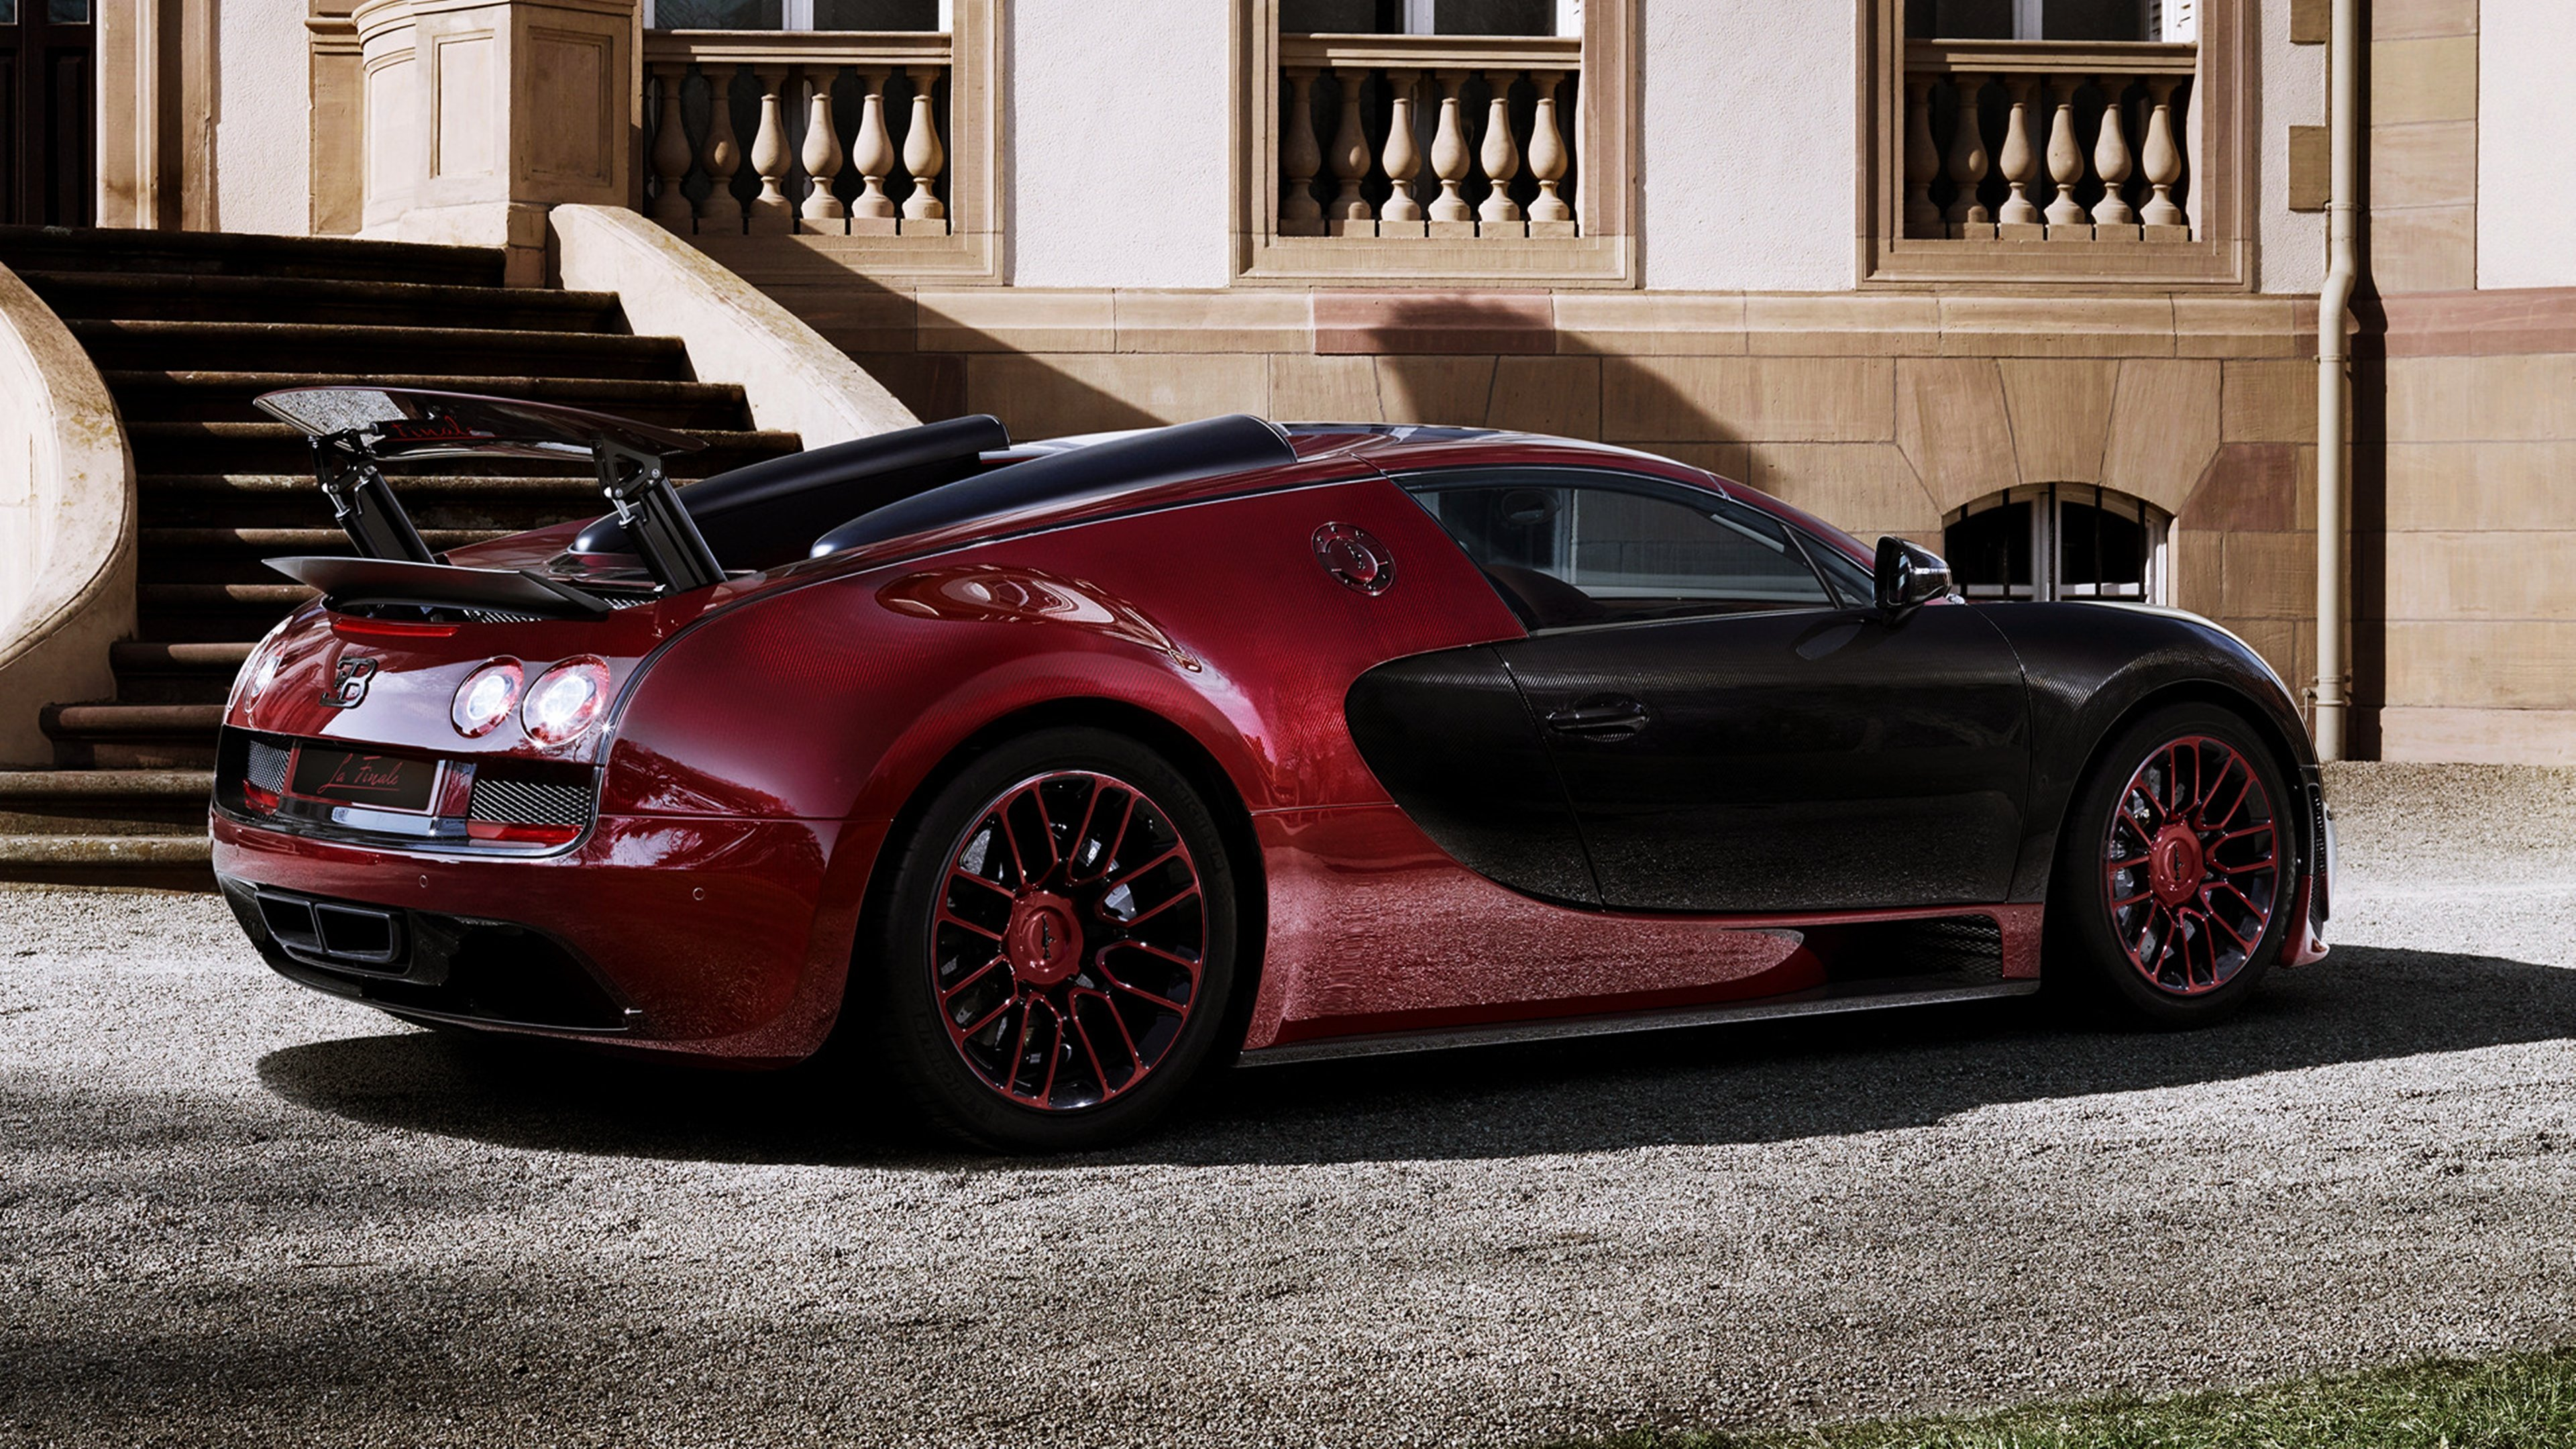 2015 bugatti veyron grand sport vitesse la finale red karim benzema buildings cars supercars. Black Bedroom Furniture Sets. Home Design Ideas